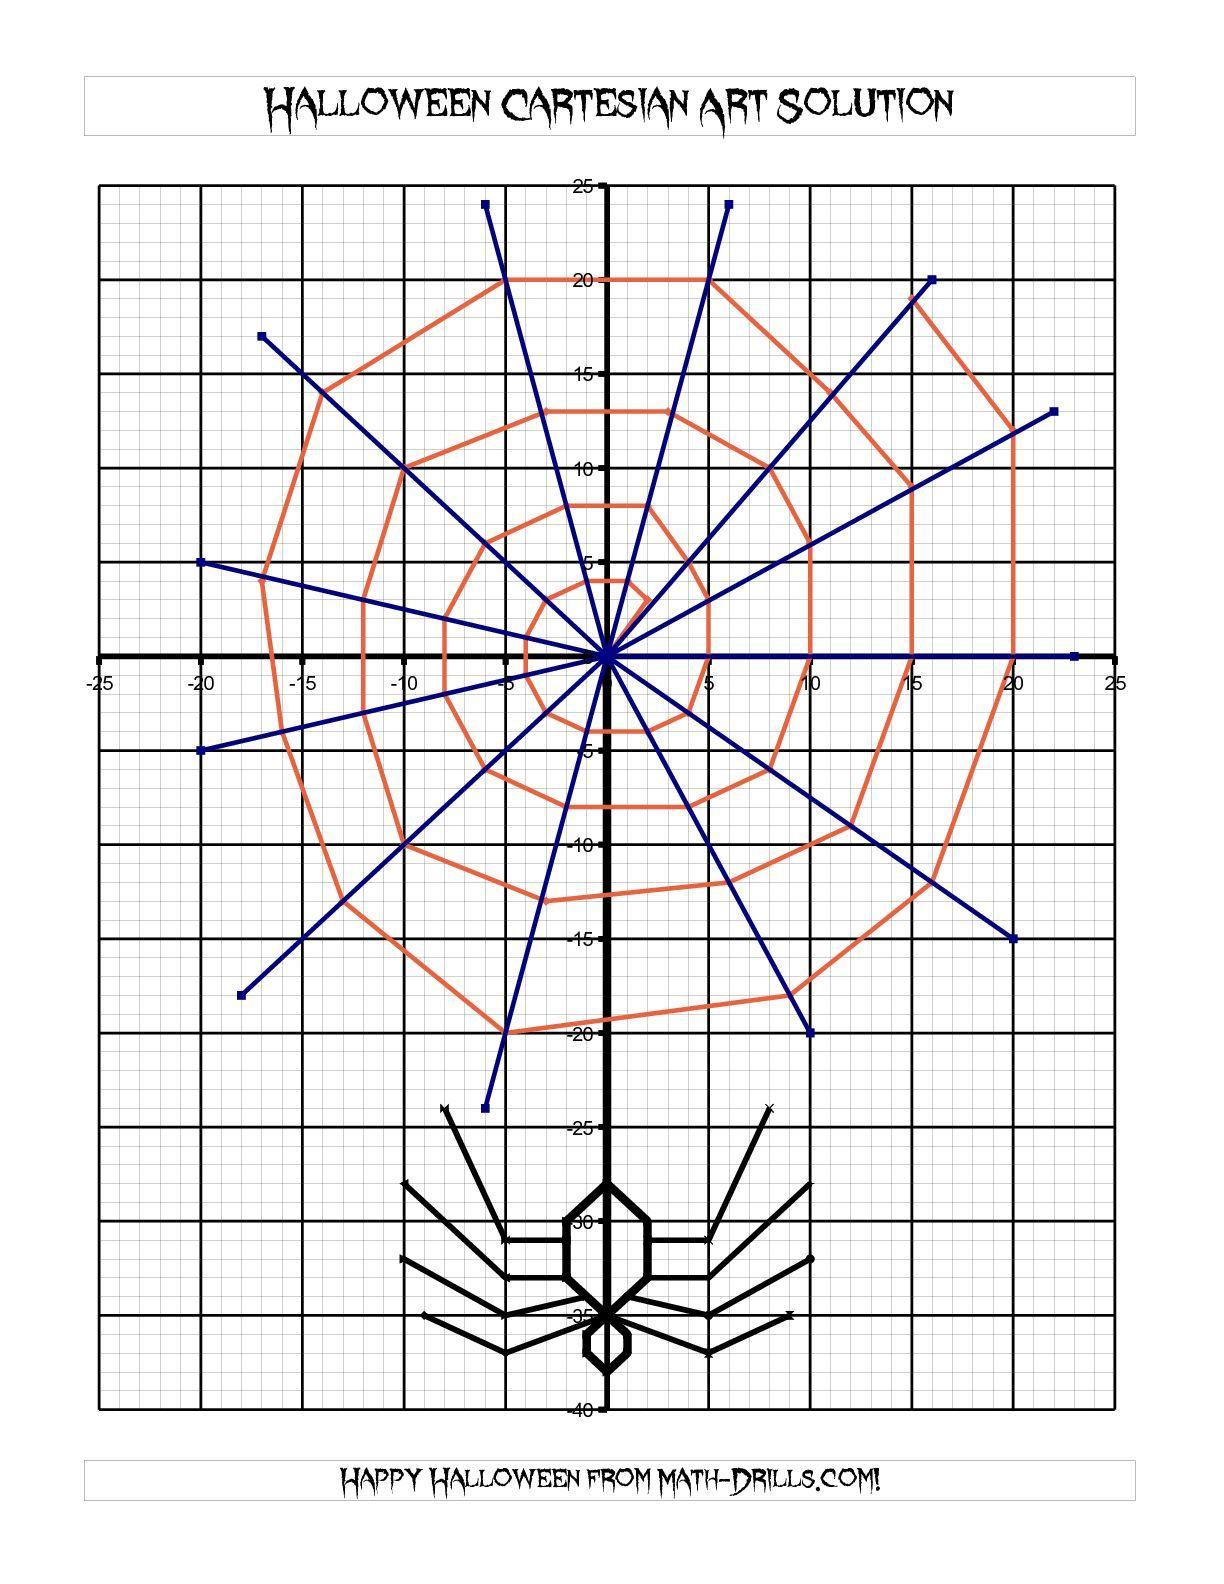 The Cartesian Art Halloween Spider Math Worksheet From The